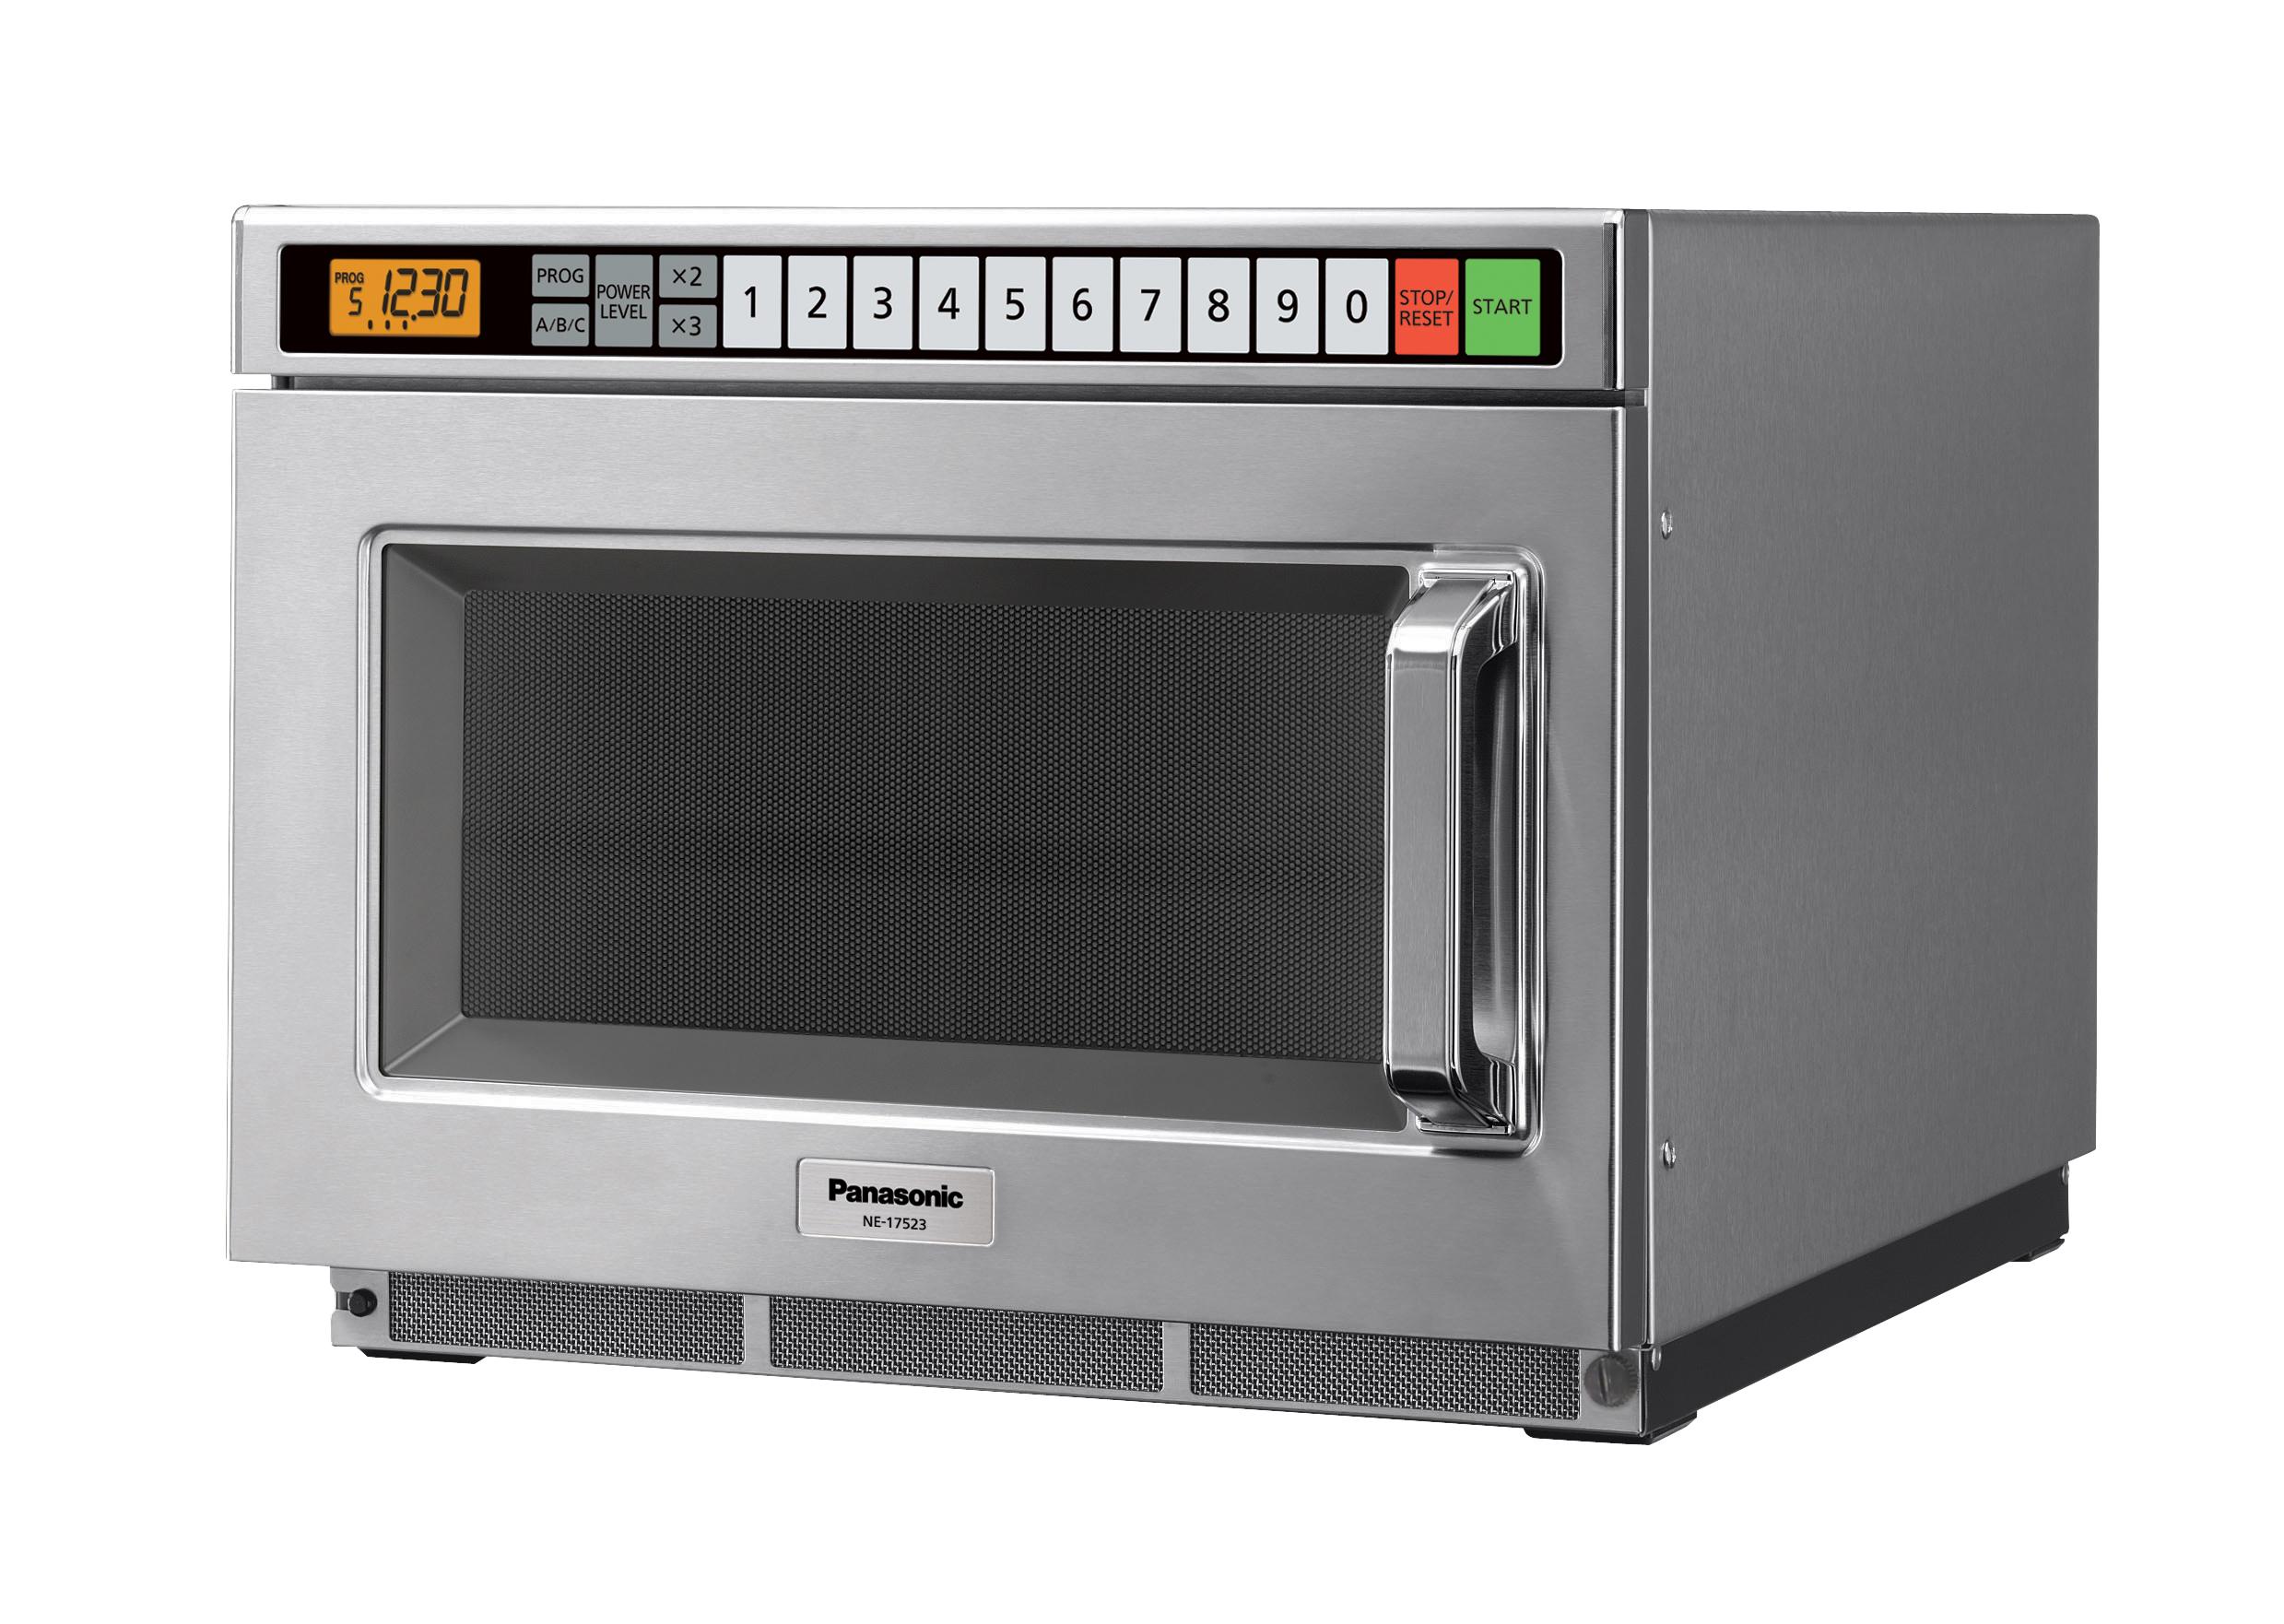 Panasonic Microwave Commercial Bestmicrowave